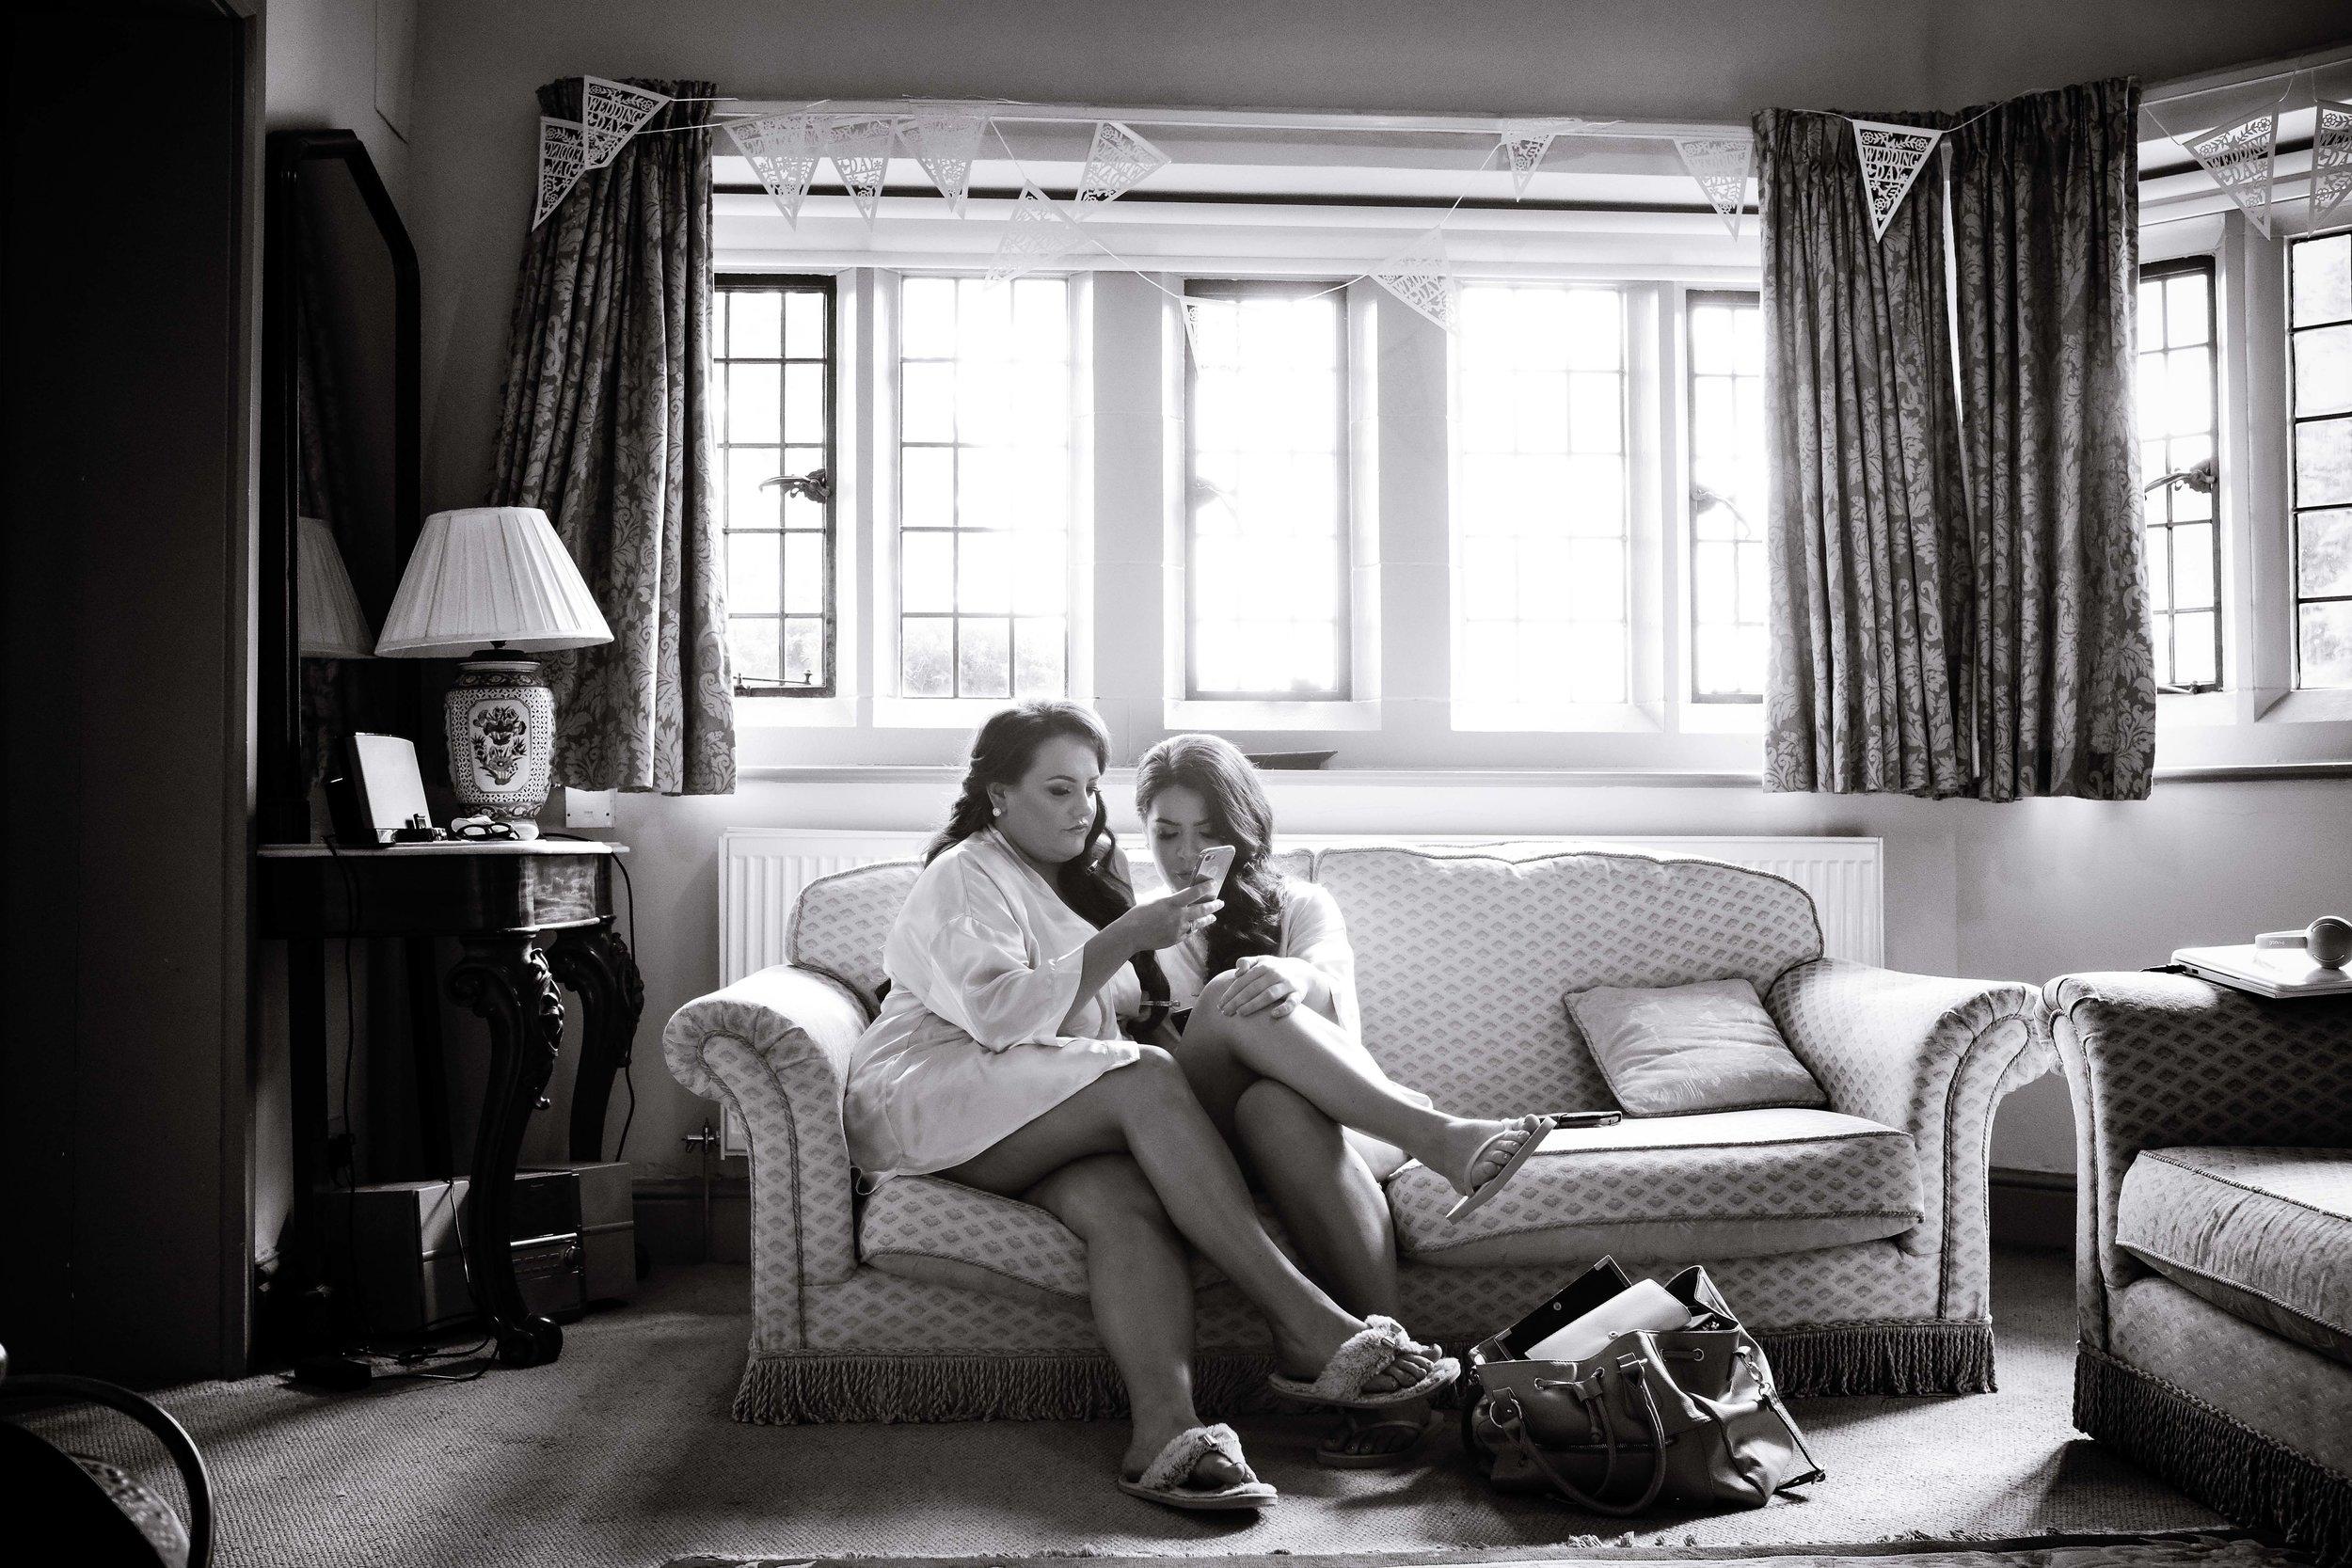 Thornton manor wedding photography cheshire wedding photographer liverpool manchester warrington chester wirral wedding BLOG (15 of 108).jpg